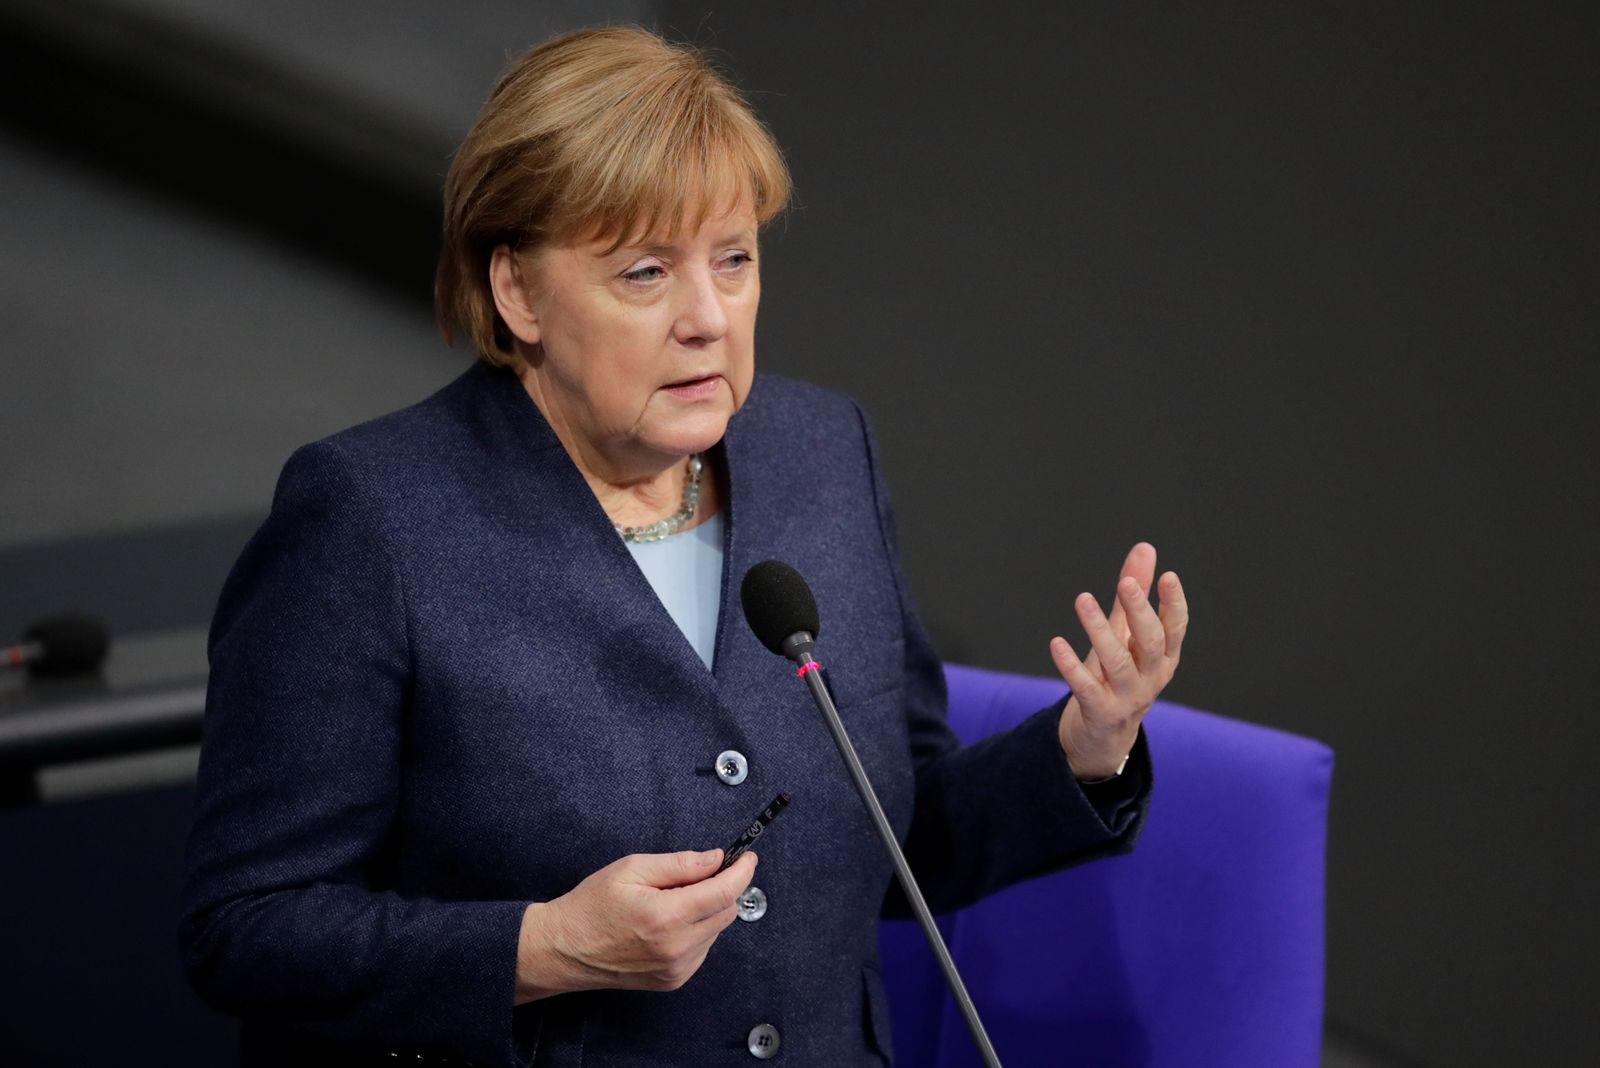 Bundestag session in Berlin